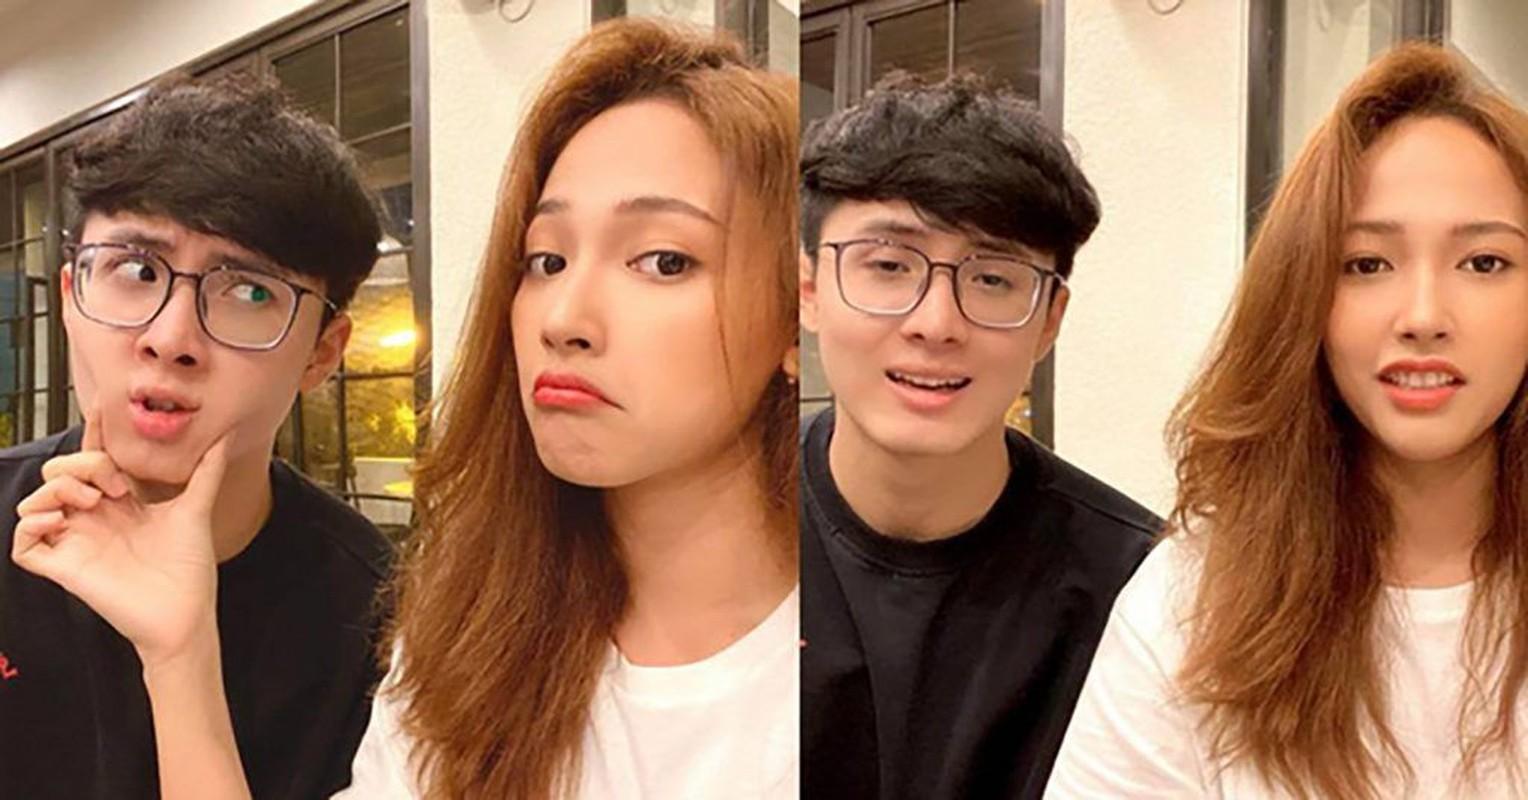 "Hang loat phat ngon ""deep"" de doi cua cac streamer Viet-Hinh-12"